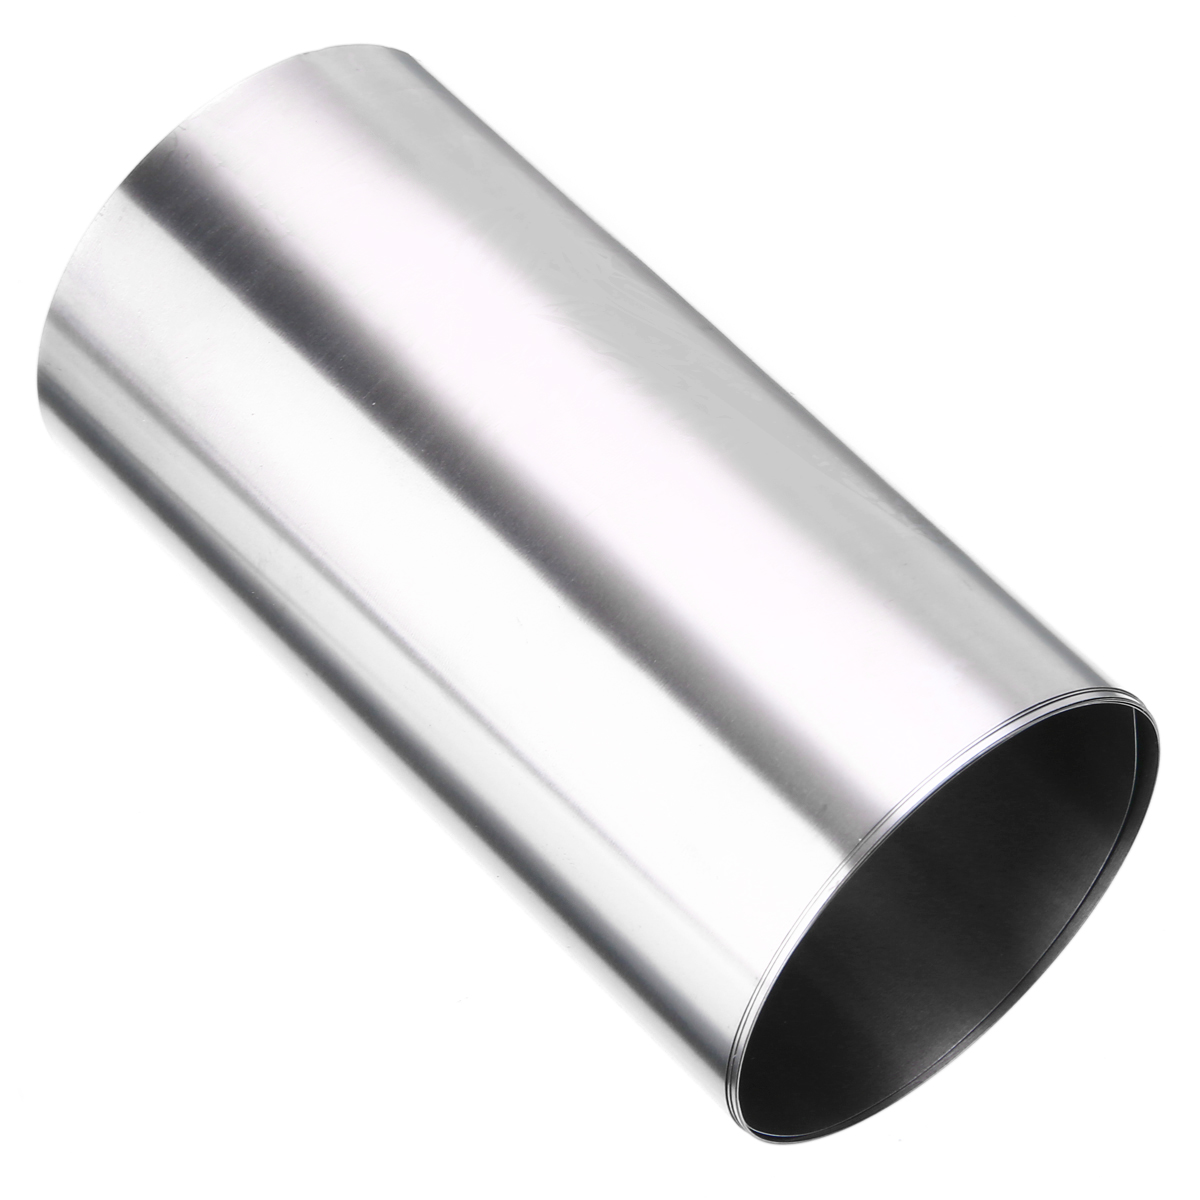 1pc Titanium Sheet 100X1000mm Ta1 Titanium Ti Thin Plate Sheet Foil 0.1mm Thickness For Metalworking